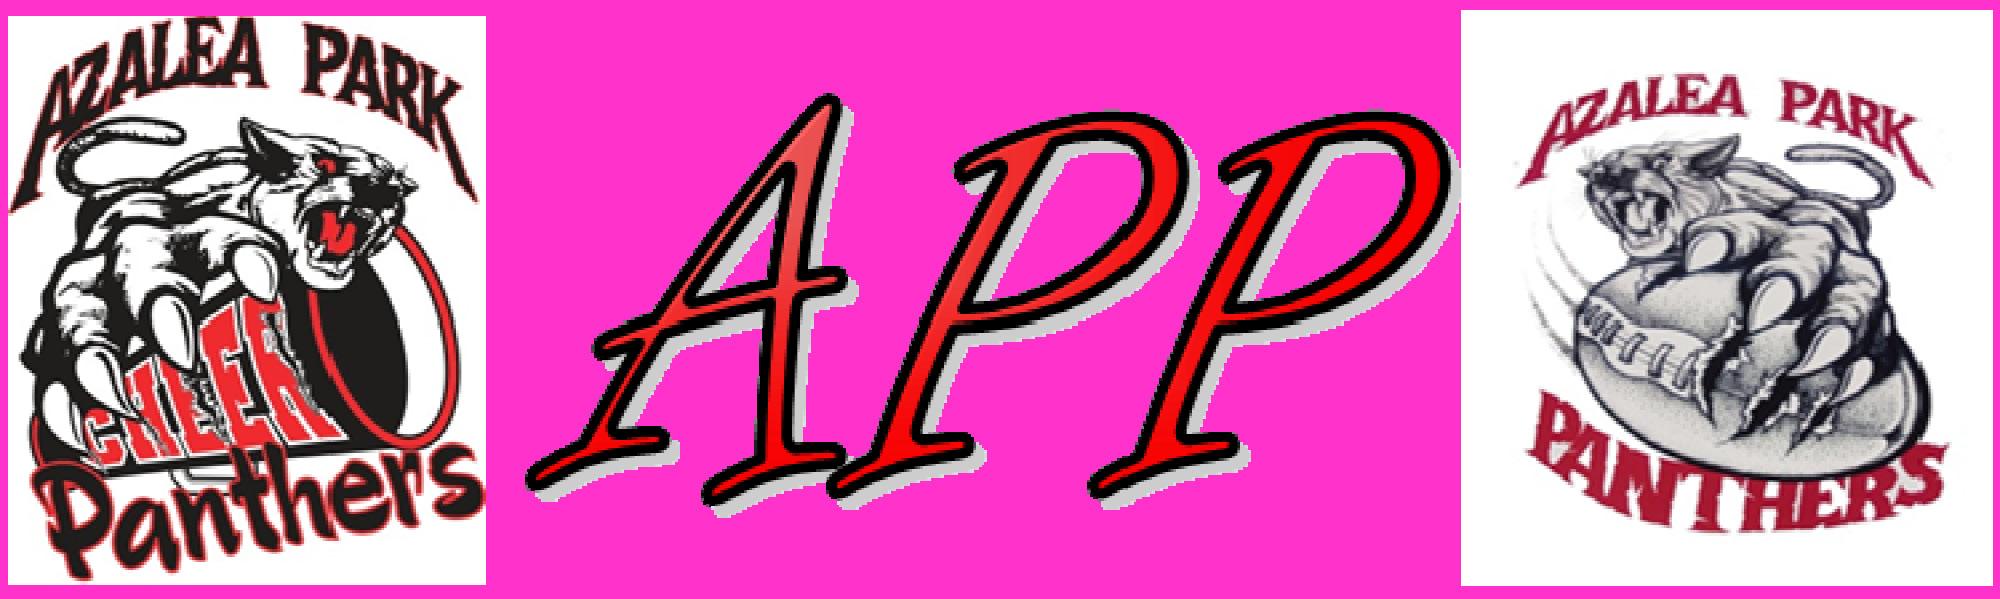 2014 Updated logo PINK BG